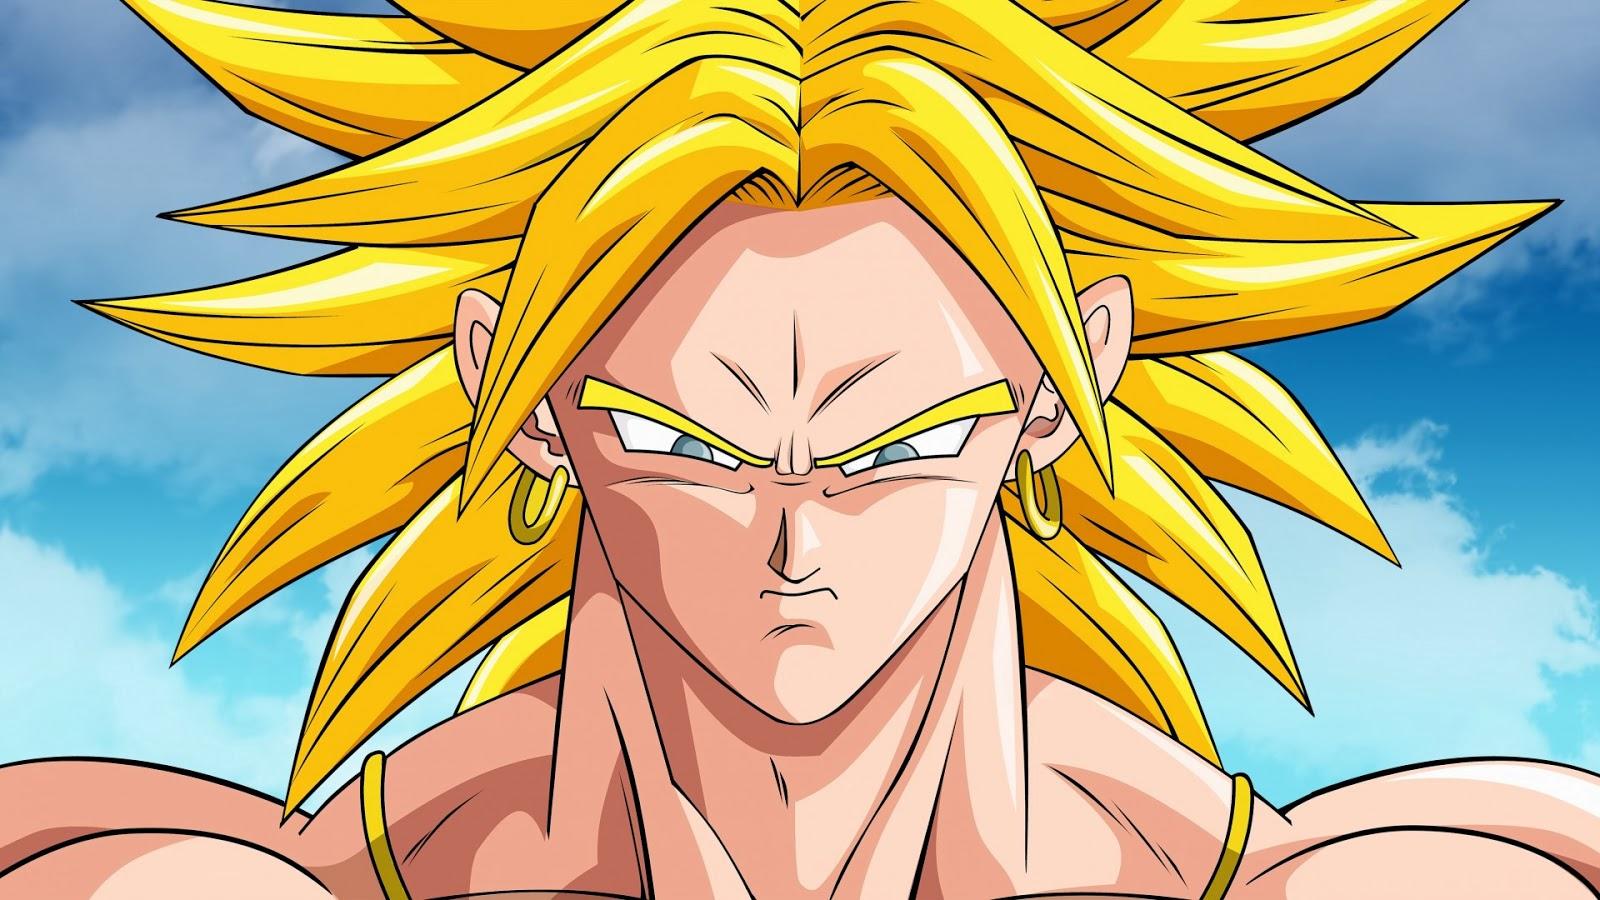 Dragon ball gt senhor todo poderoso rei yaka yaka yaka ludo - 5 9